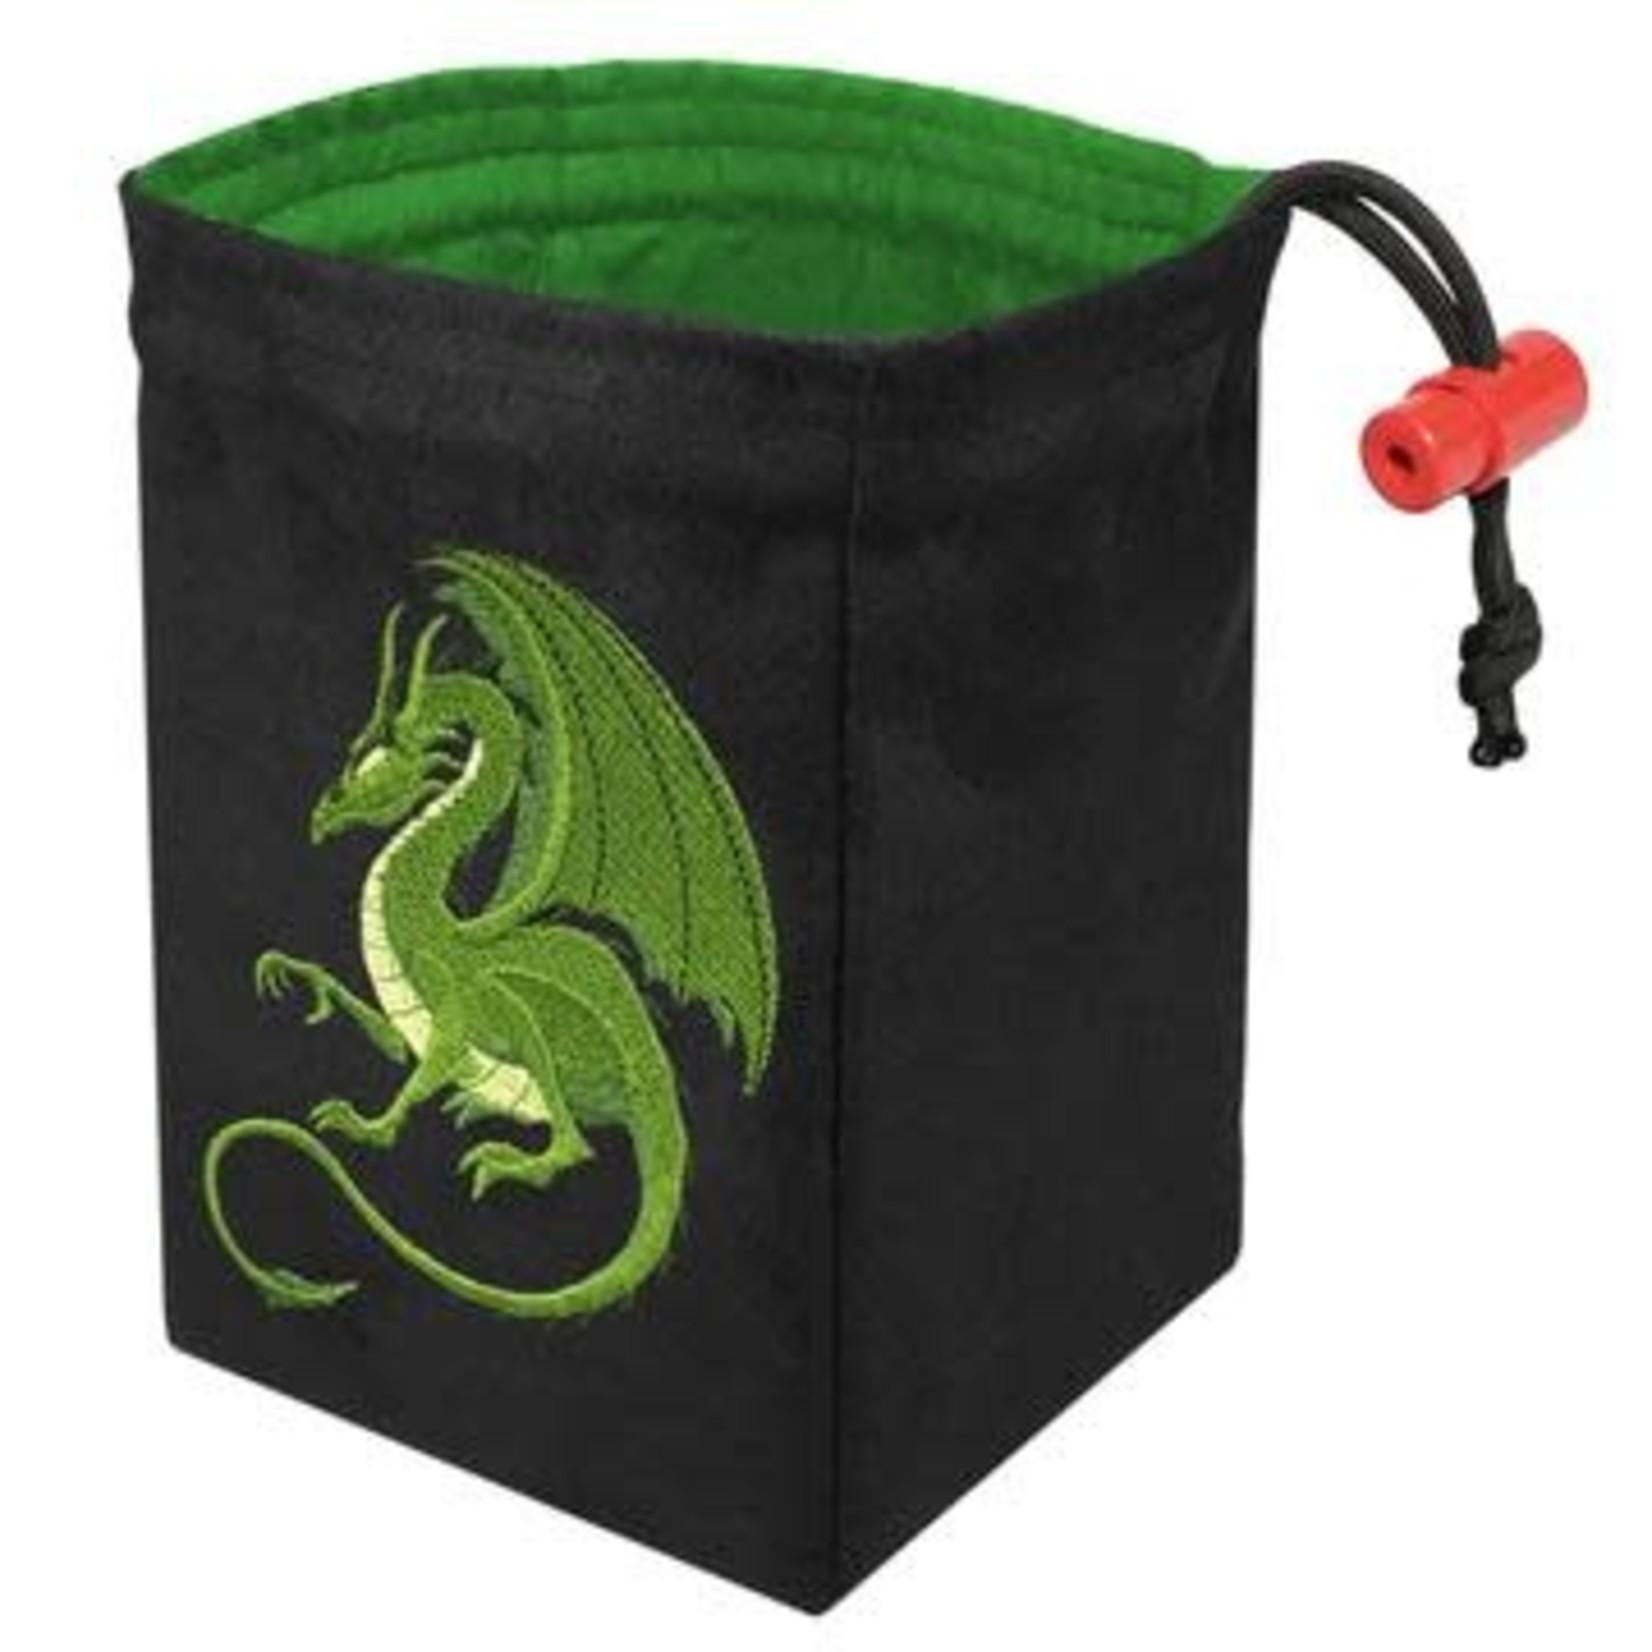 Red King Dice Bag: Fantasy Green Dragon